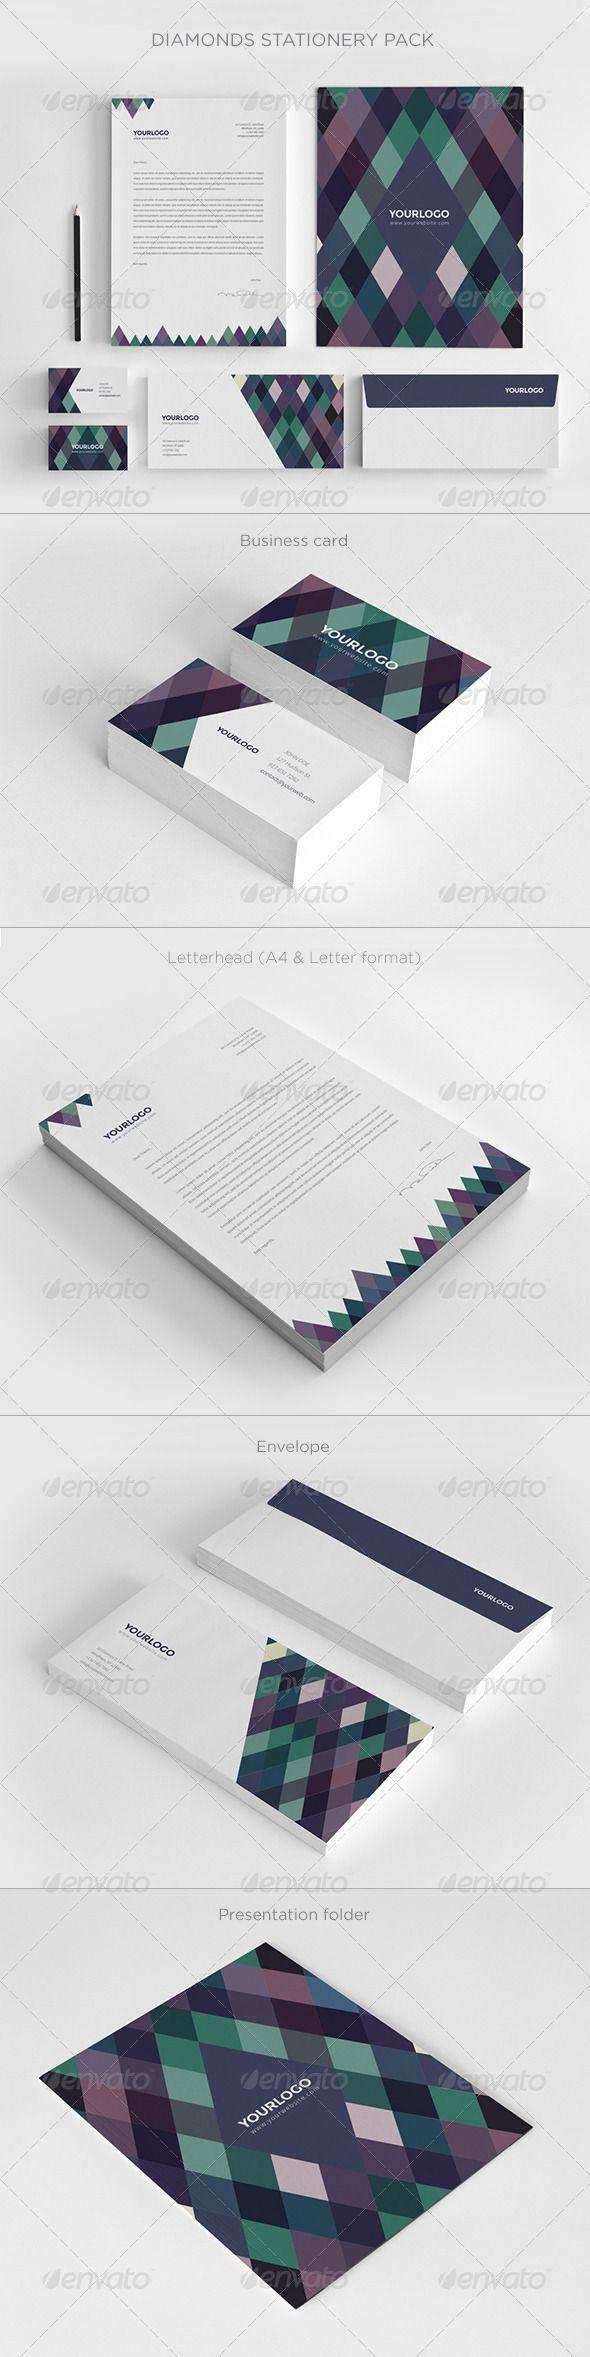 Diamonds Stationery Pack Stationery Print Templates